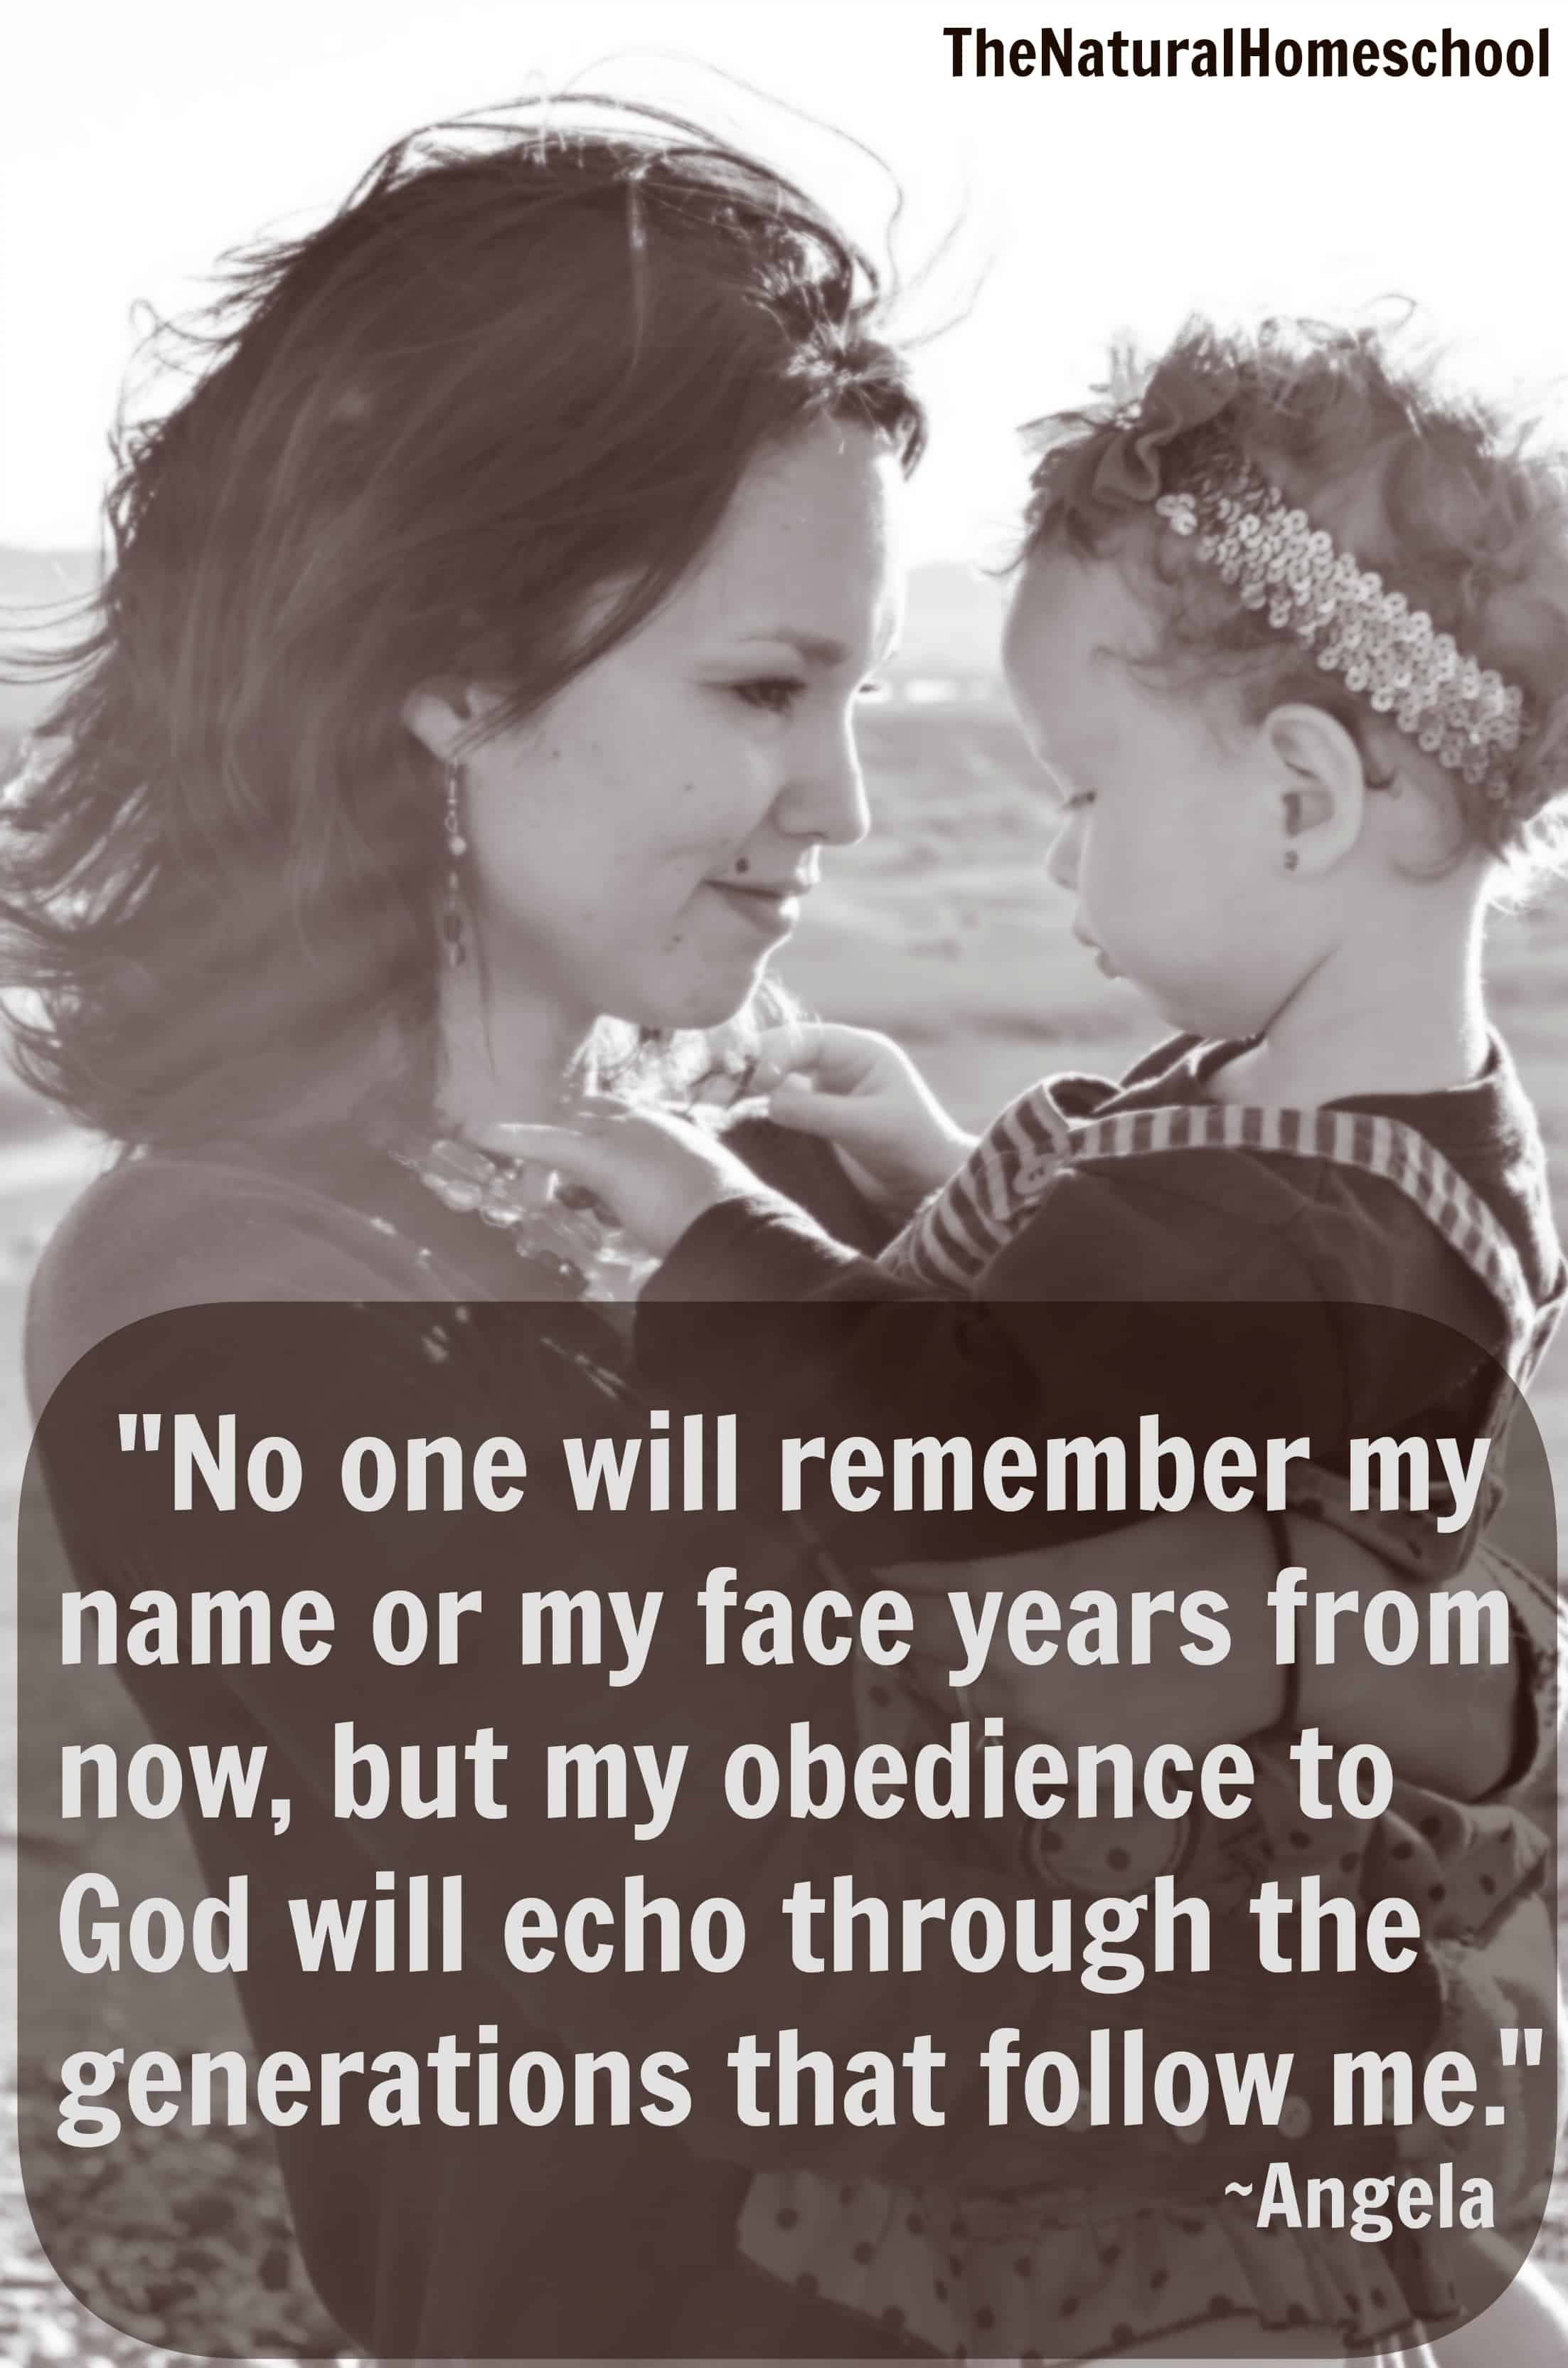 Quote www.thenaturalhomeschool.com